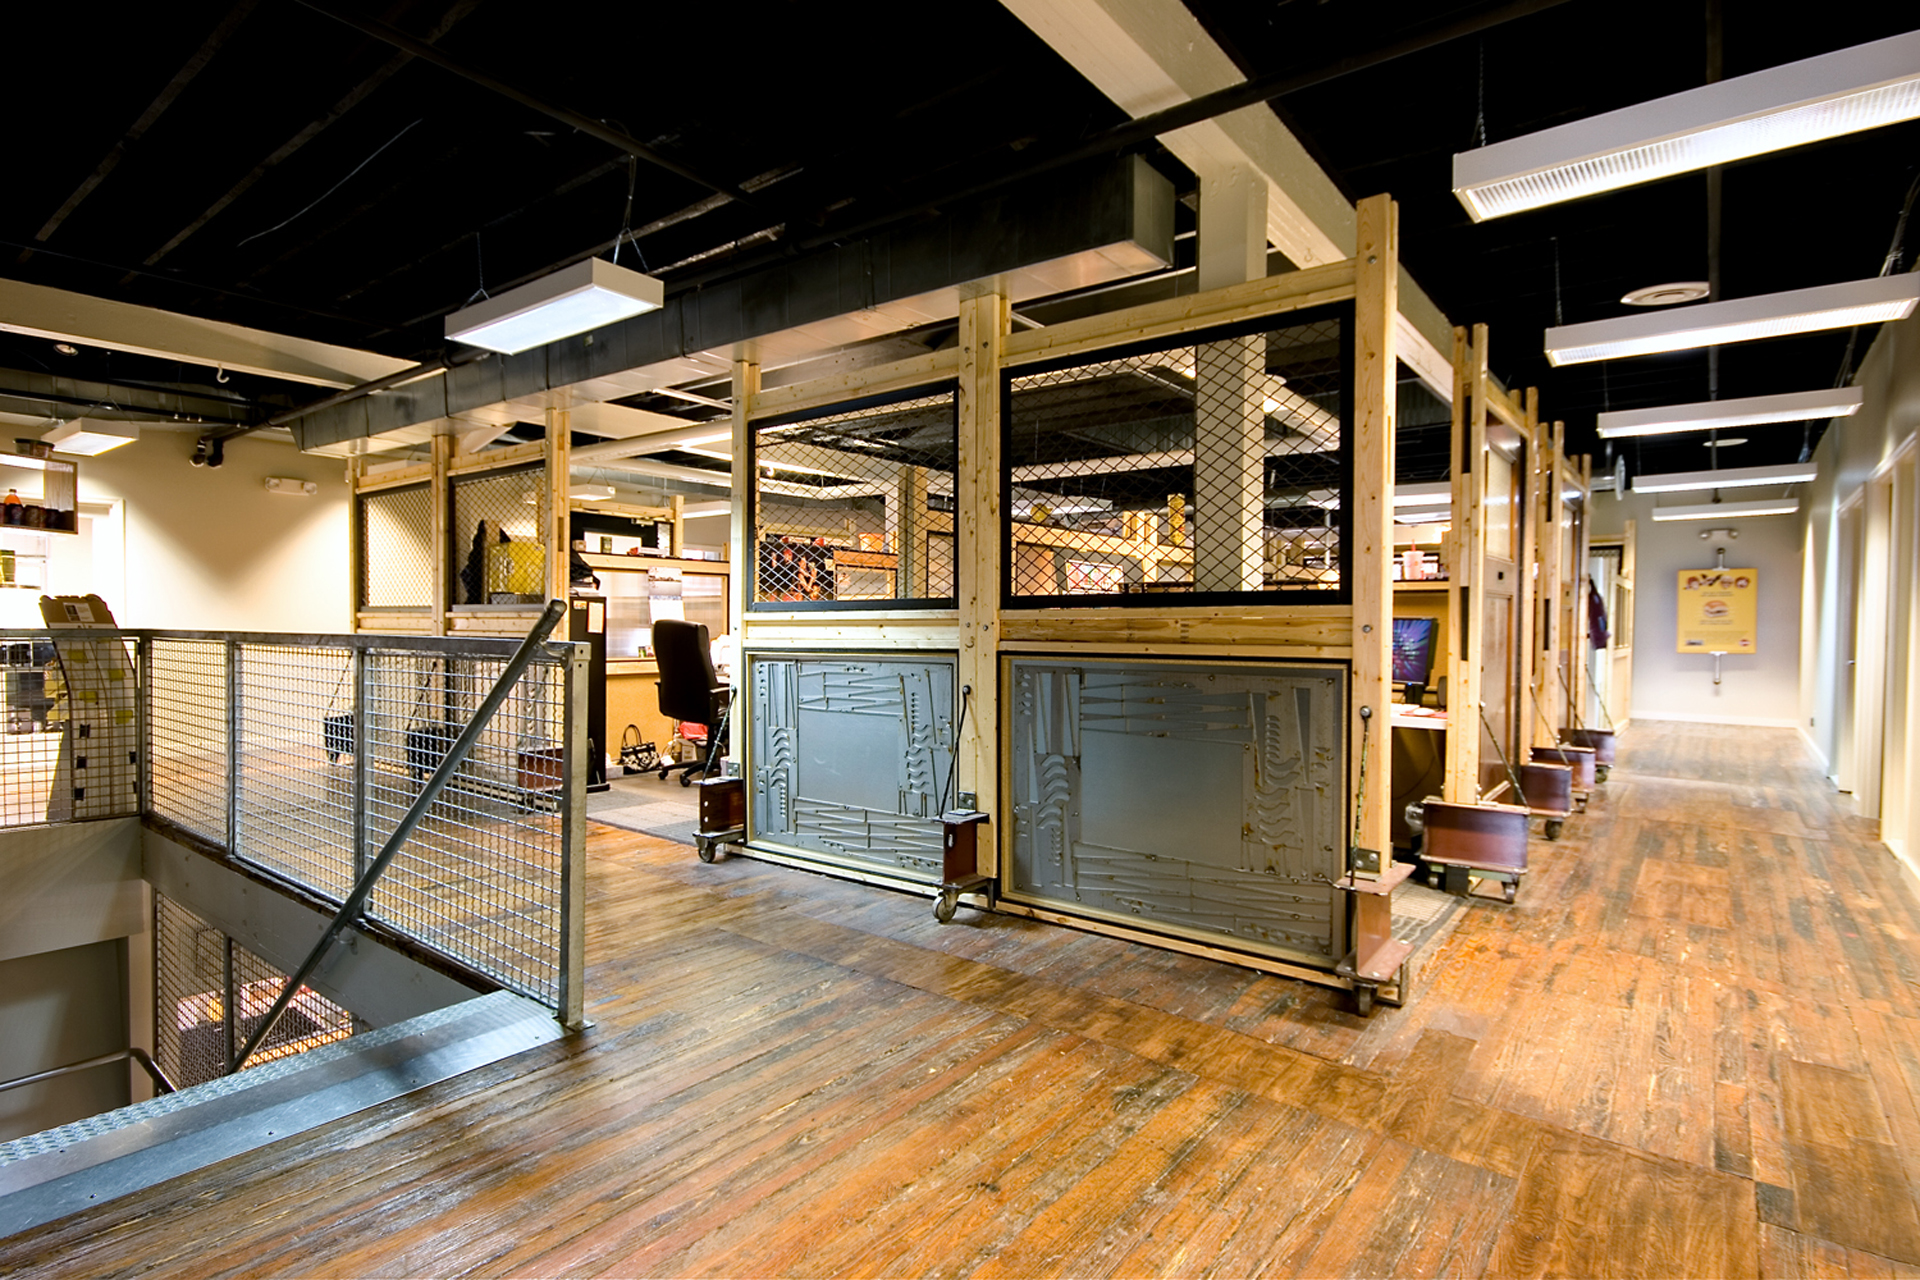 Johnson Group Interior Architecture